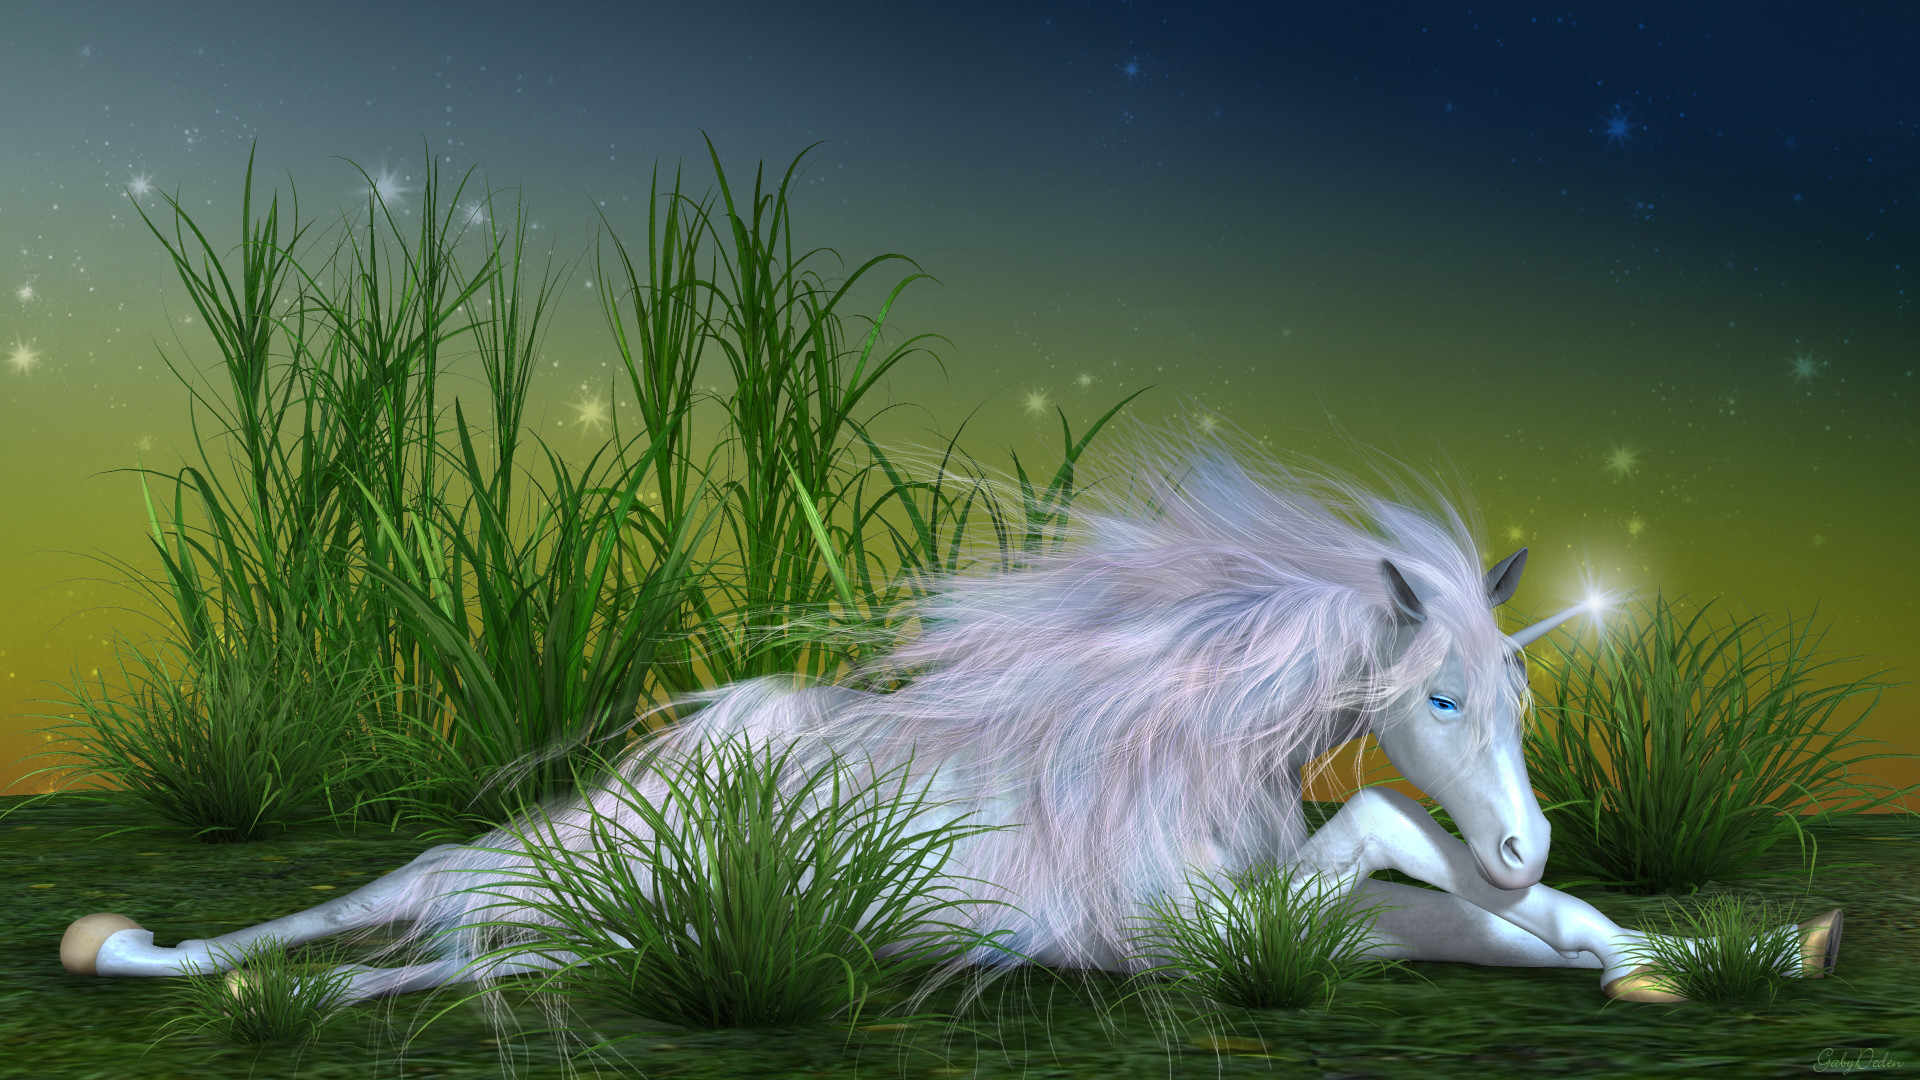 Unicorn Desktop Wallpaper – Wallpaper, High Definition, High Quality .